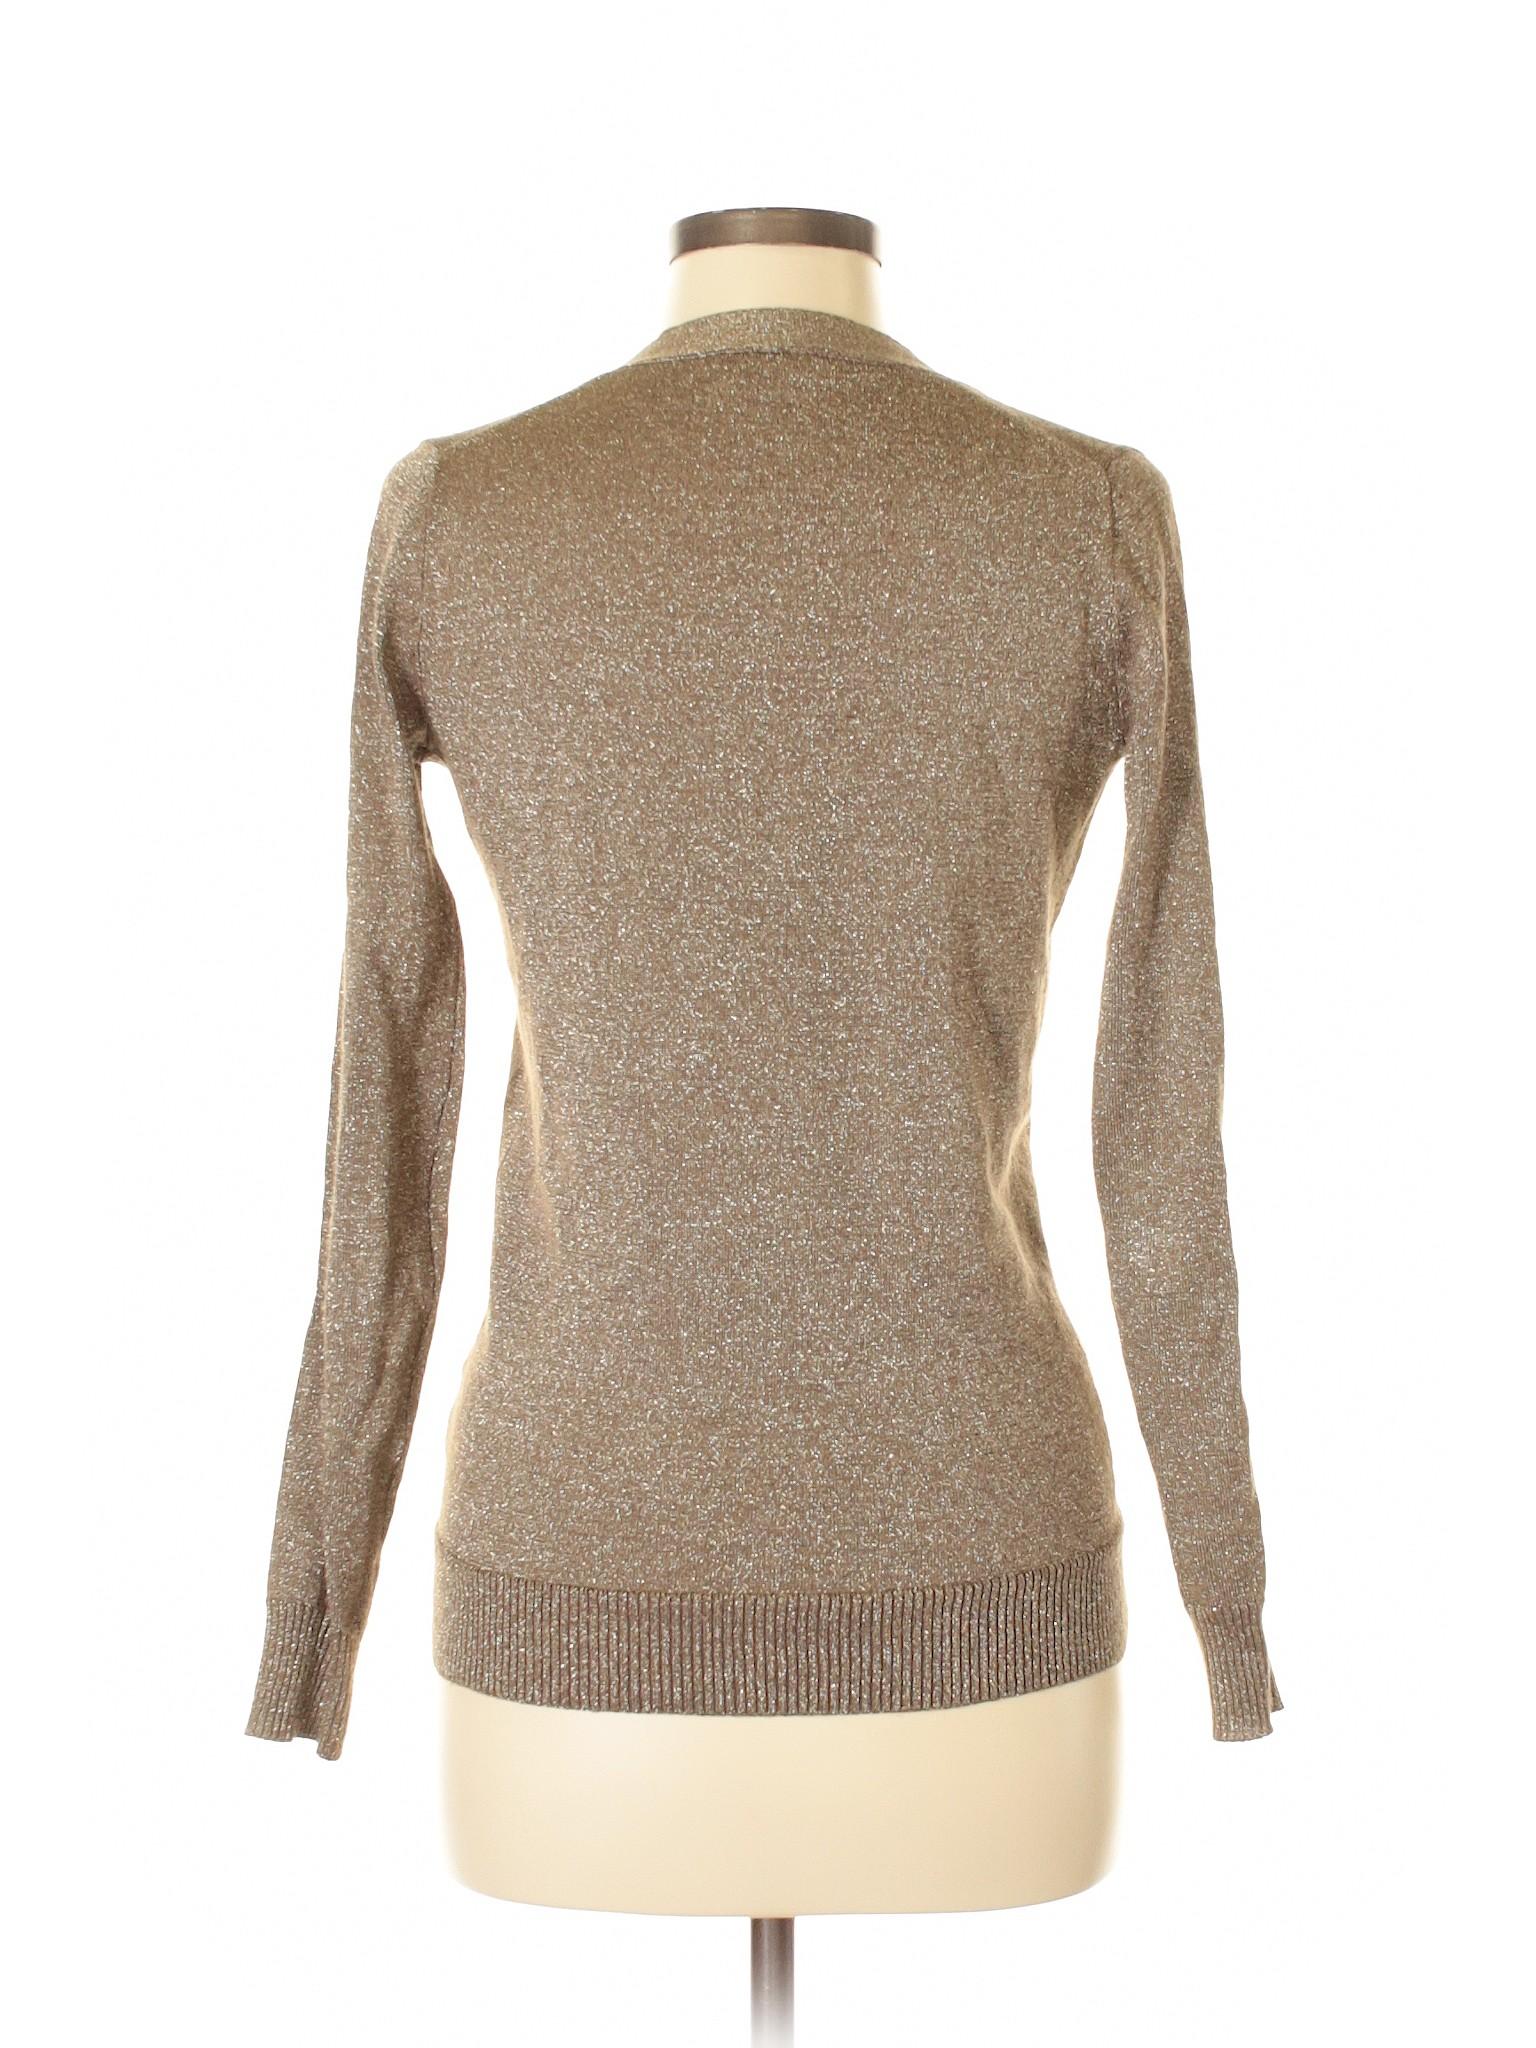 Wallace Boutique Cardigan Wool Boutique Wallace Eq757U